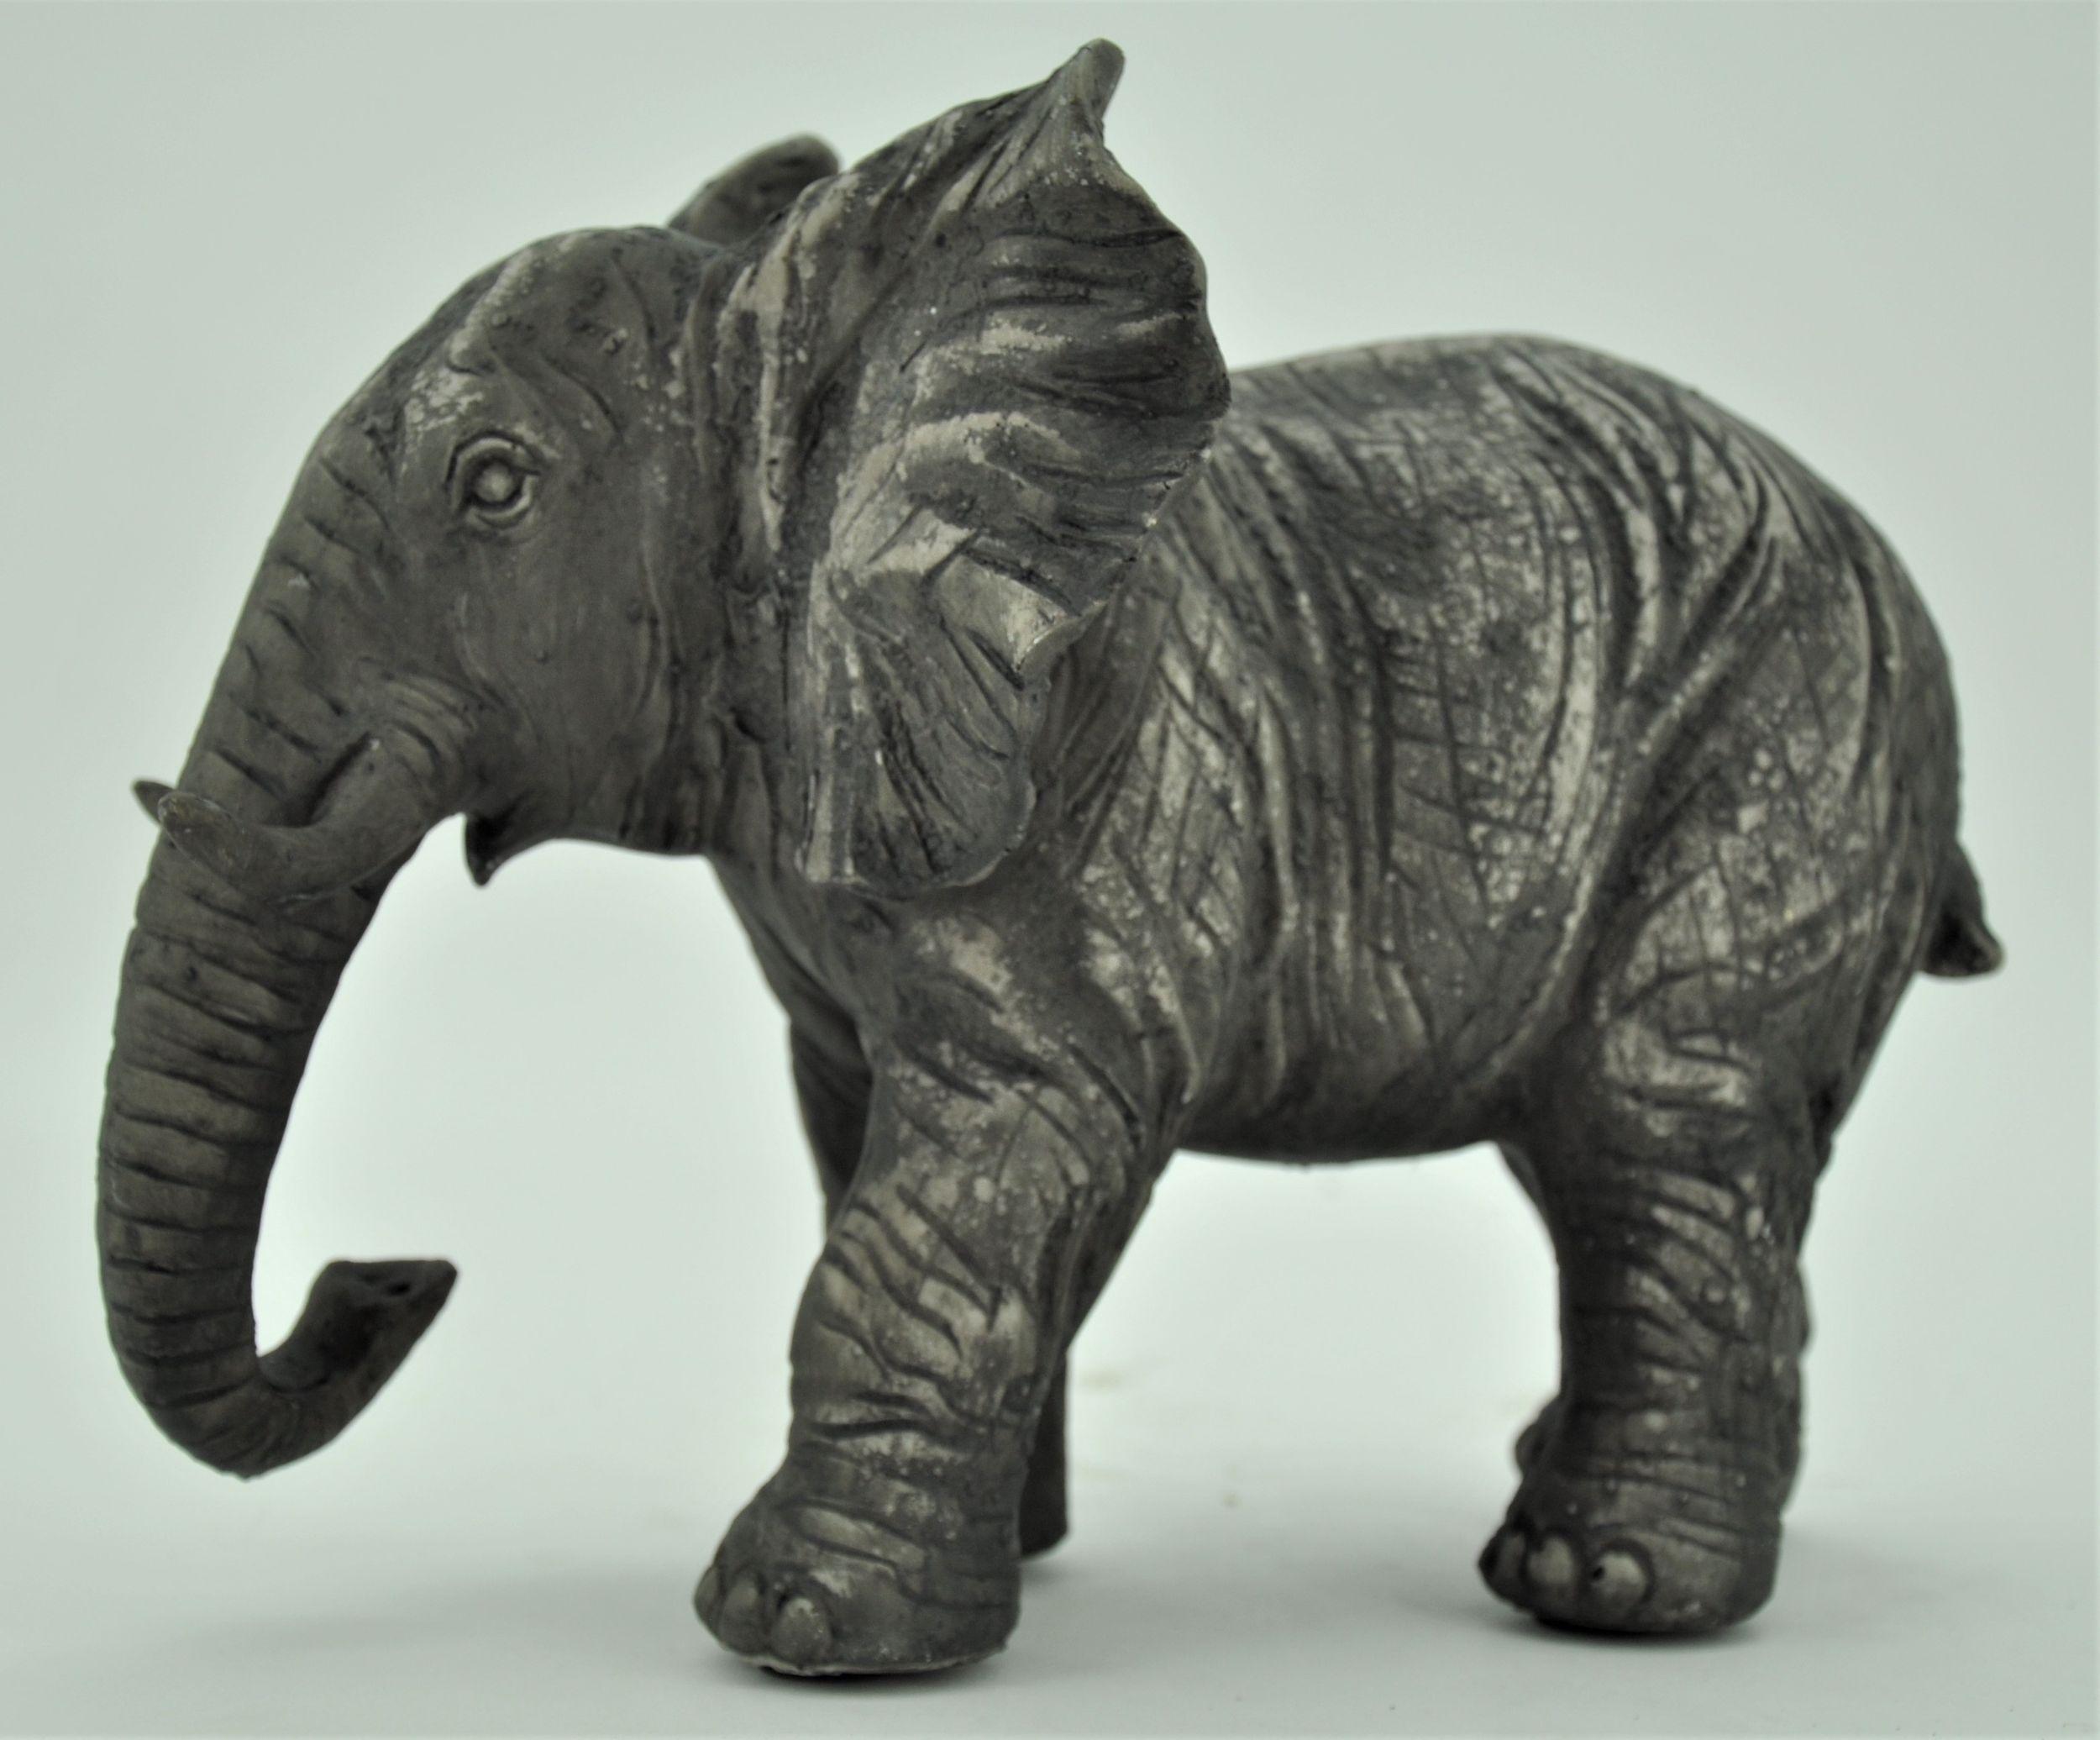 dekofigur skulptur elefant jimmy 22 5cm hoch. Black Bedroom Furniture Sets. Home Design Ideas